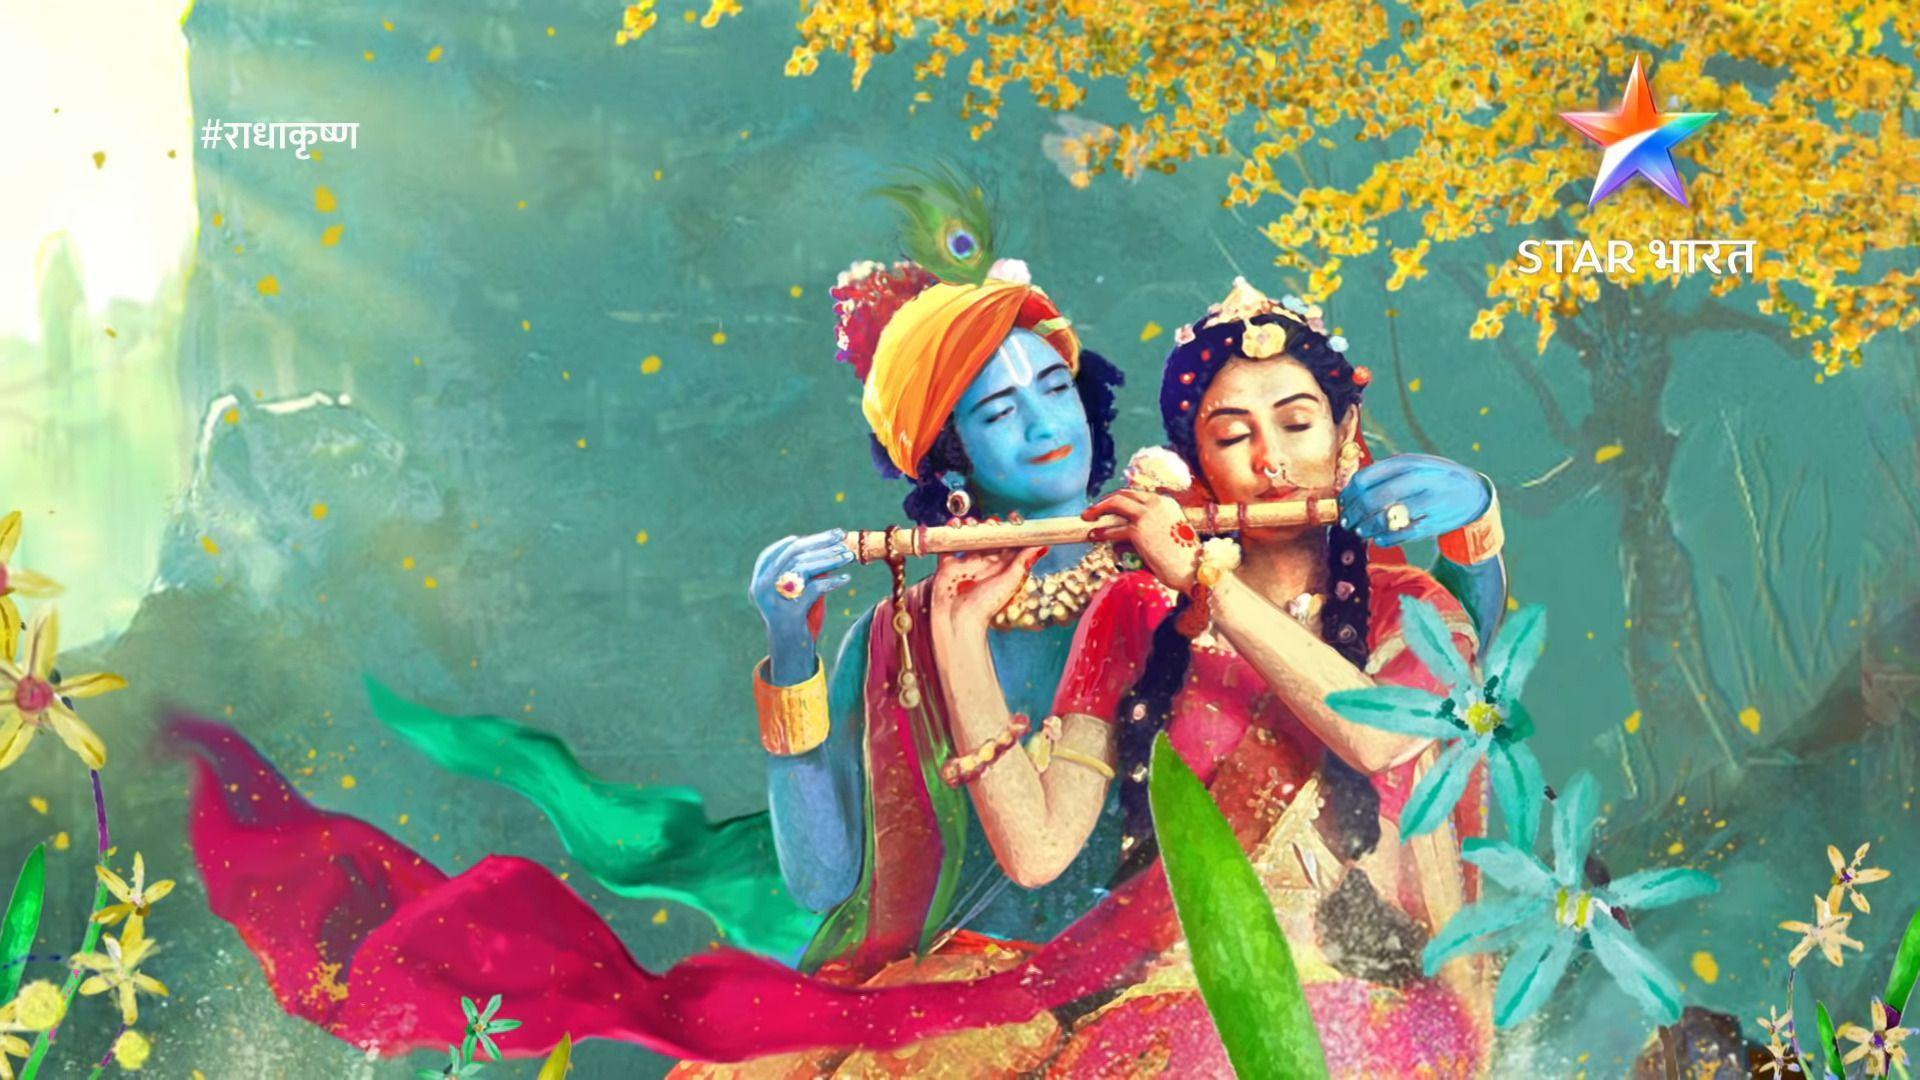 Hd Wallpapers For Pc Radha Krishna